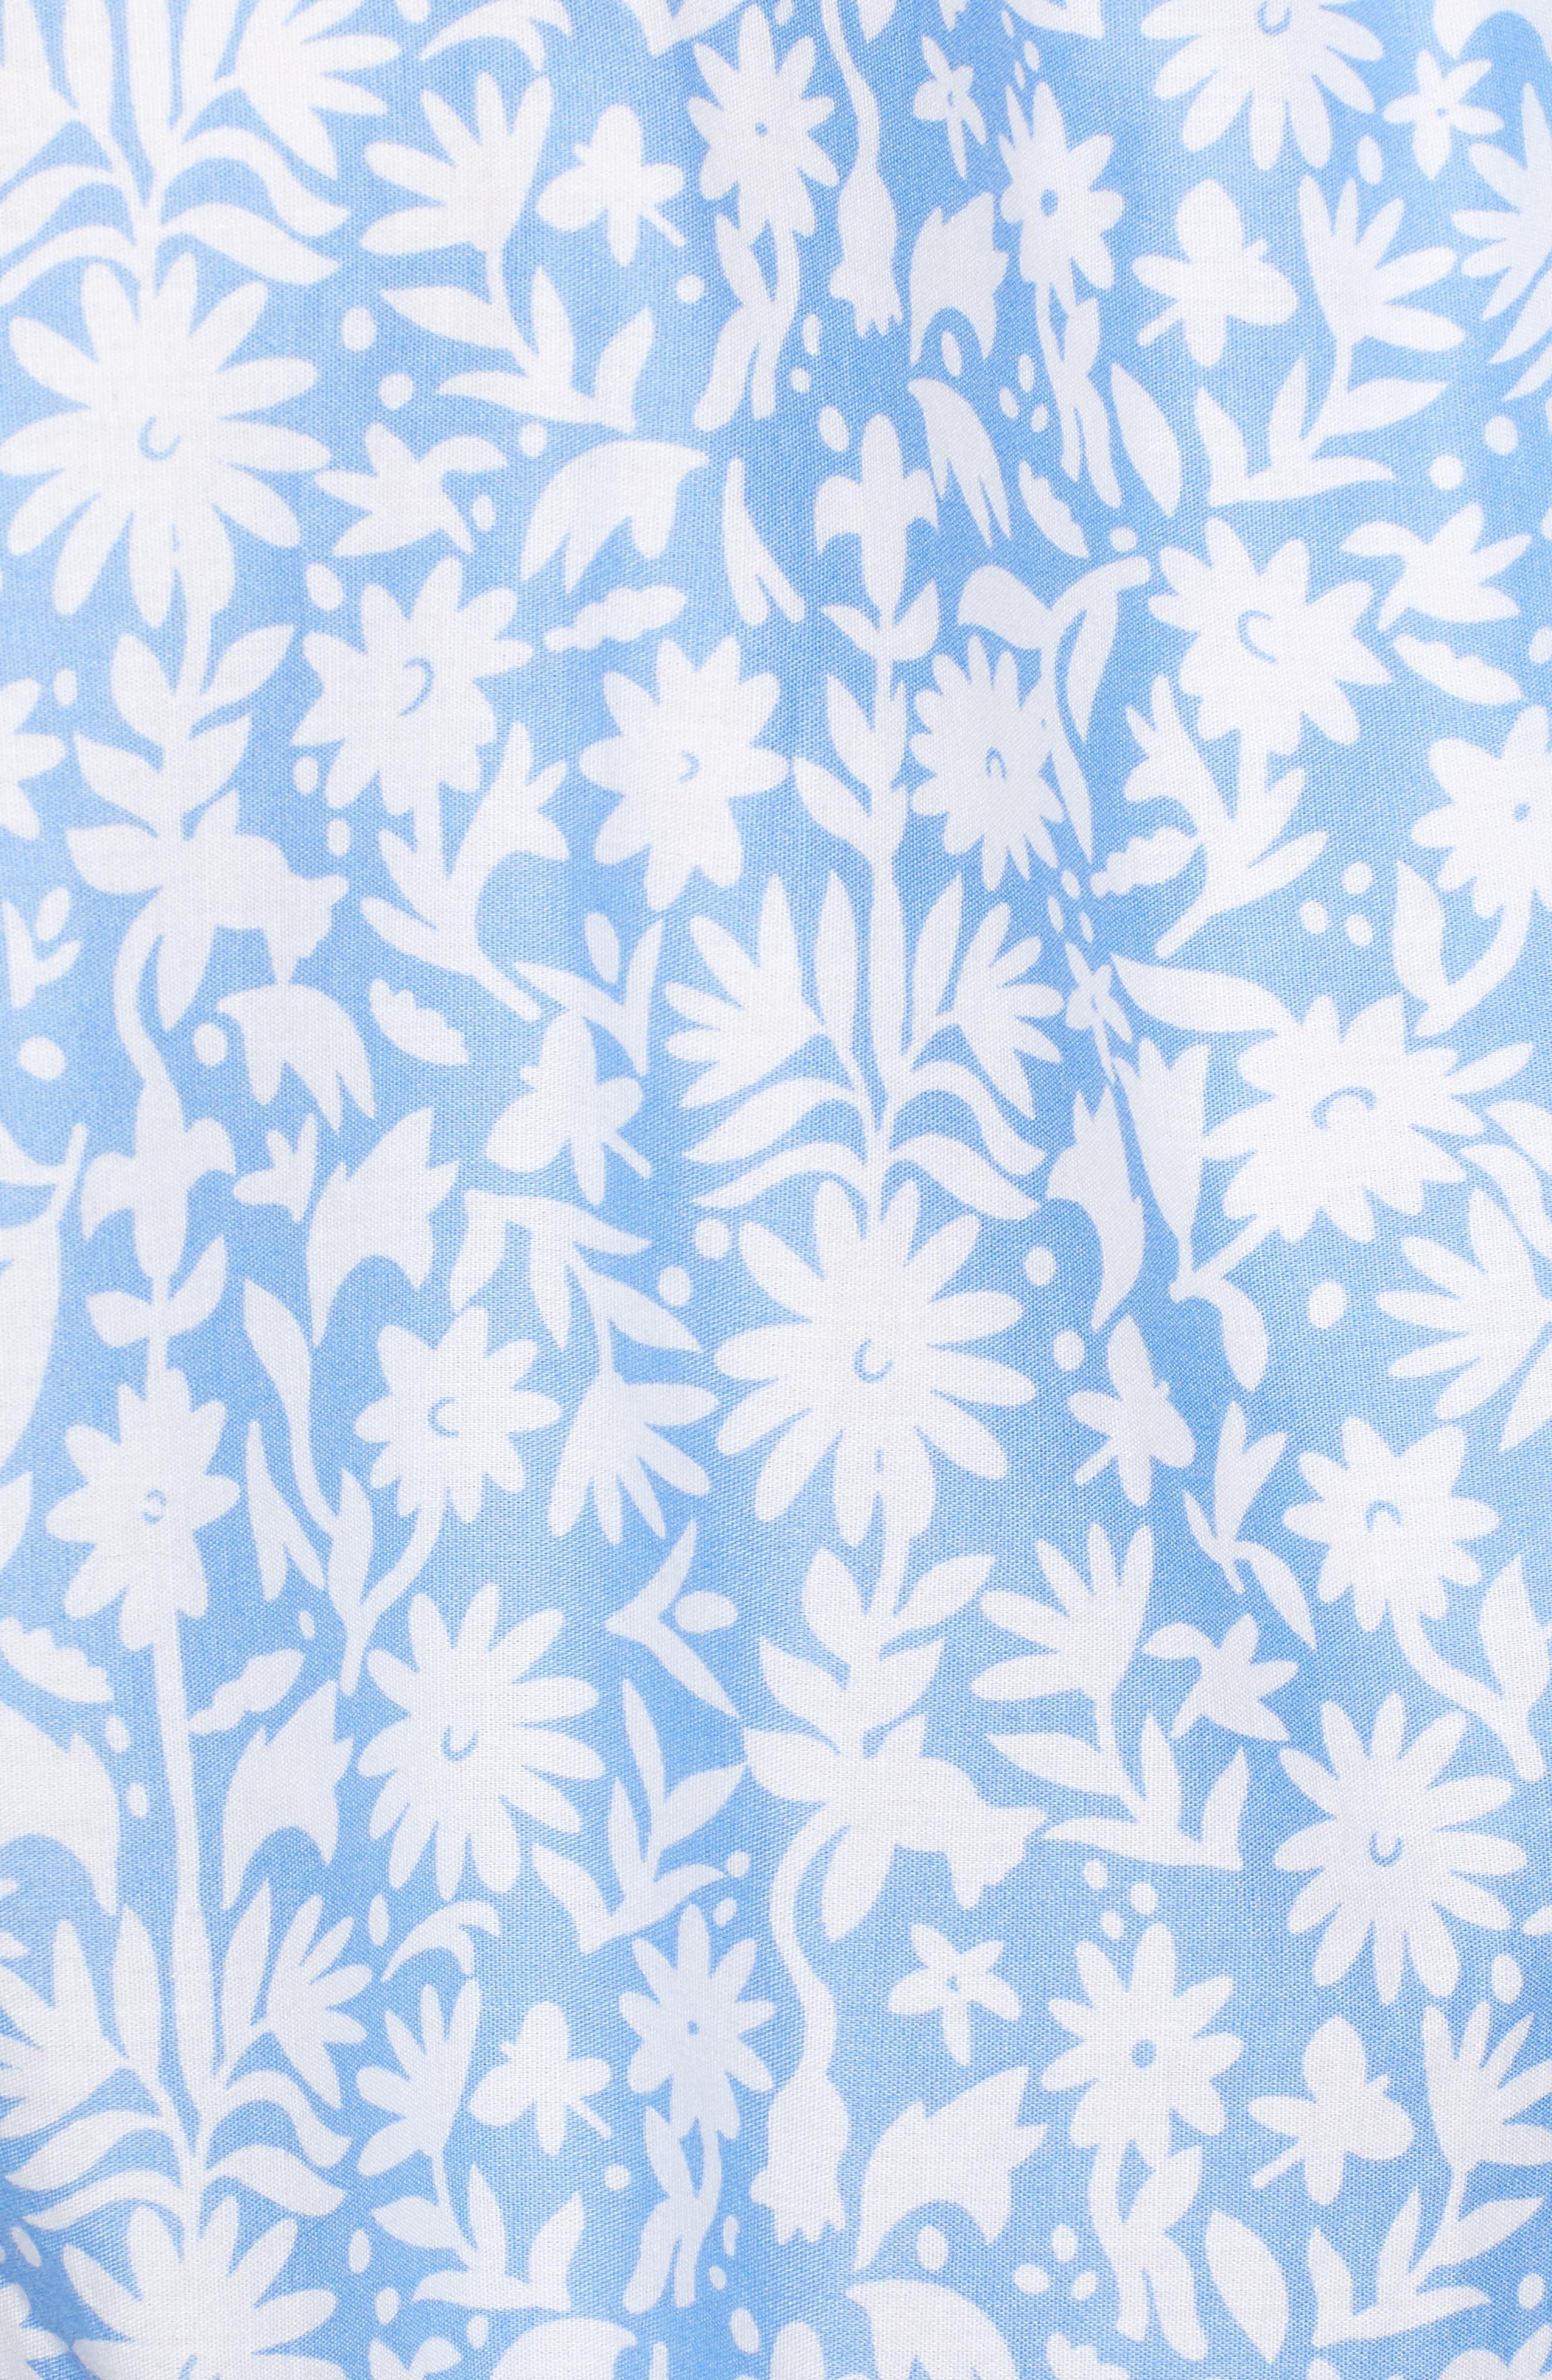 Otomi Print Off the Shoulder Cotton Romper,                             Alternate thumbnail 5, color,                             HYDRANGEA